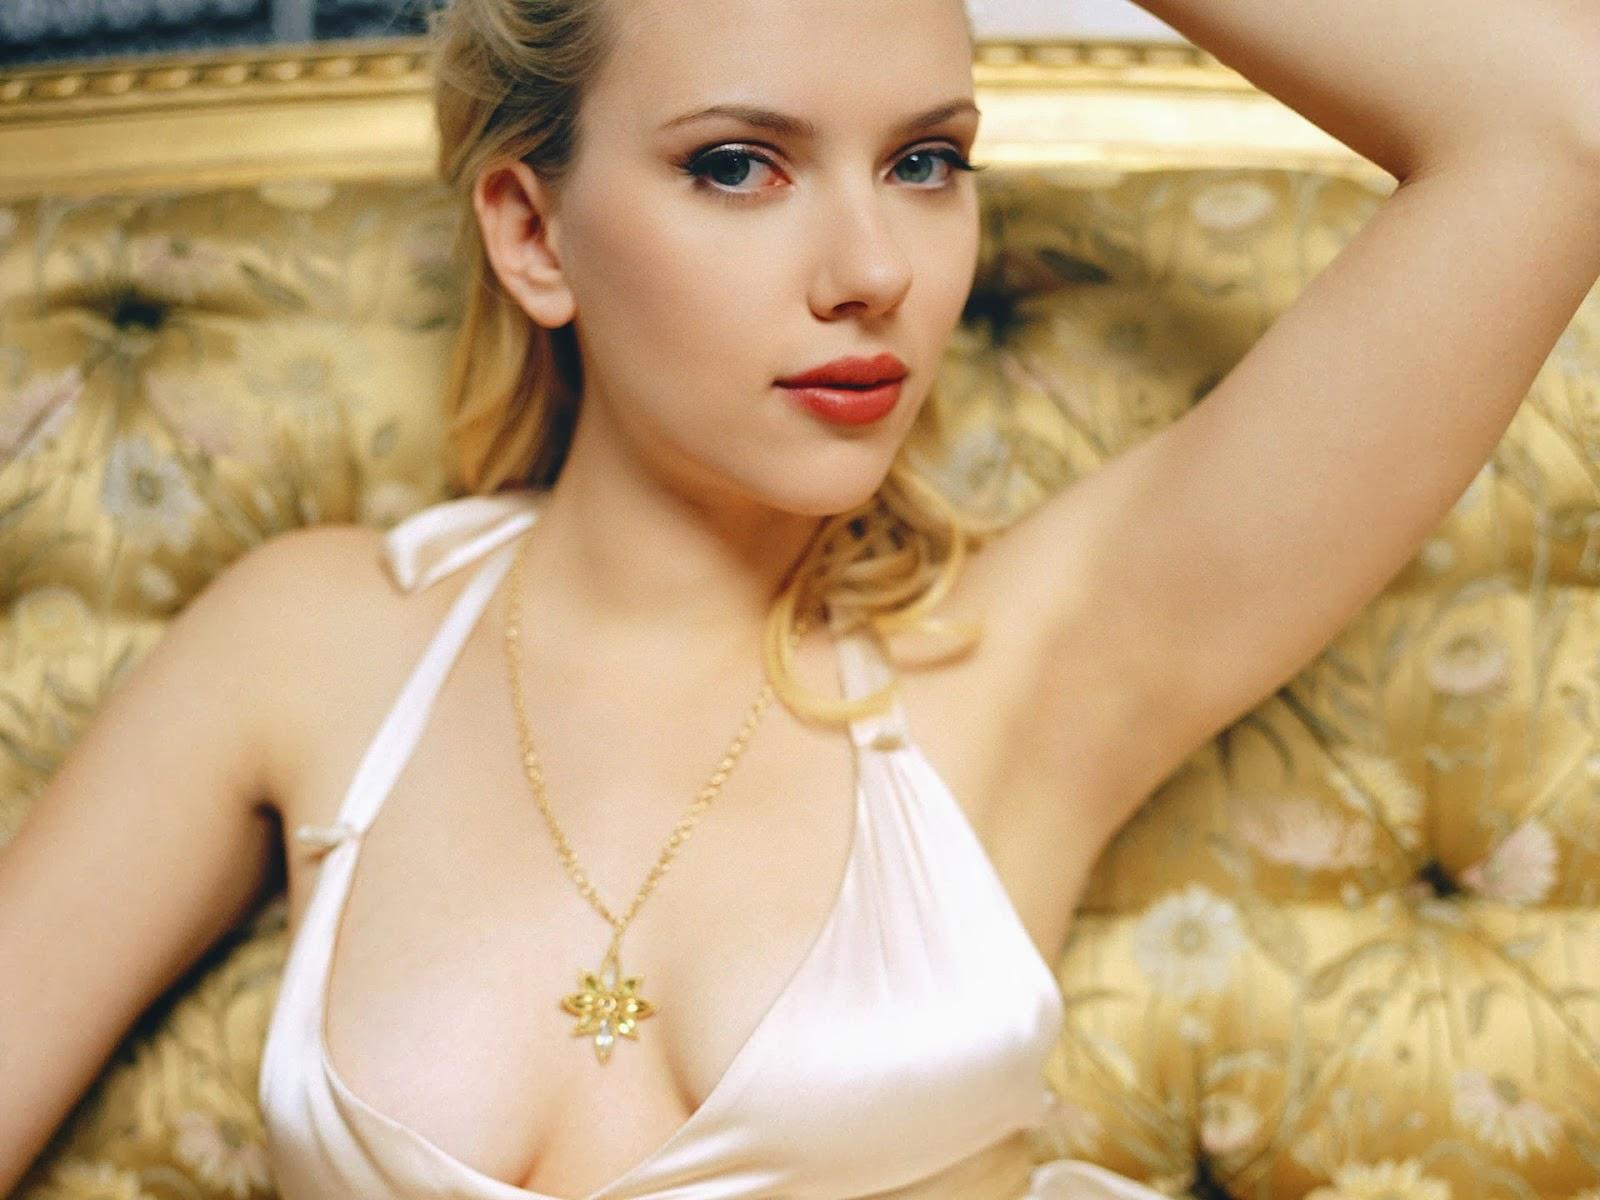 Scarlett johansson free stock photos free stock photos